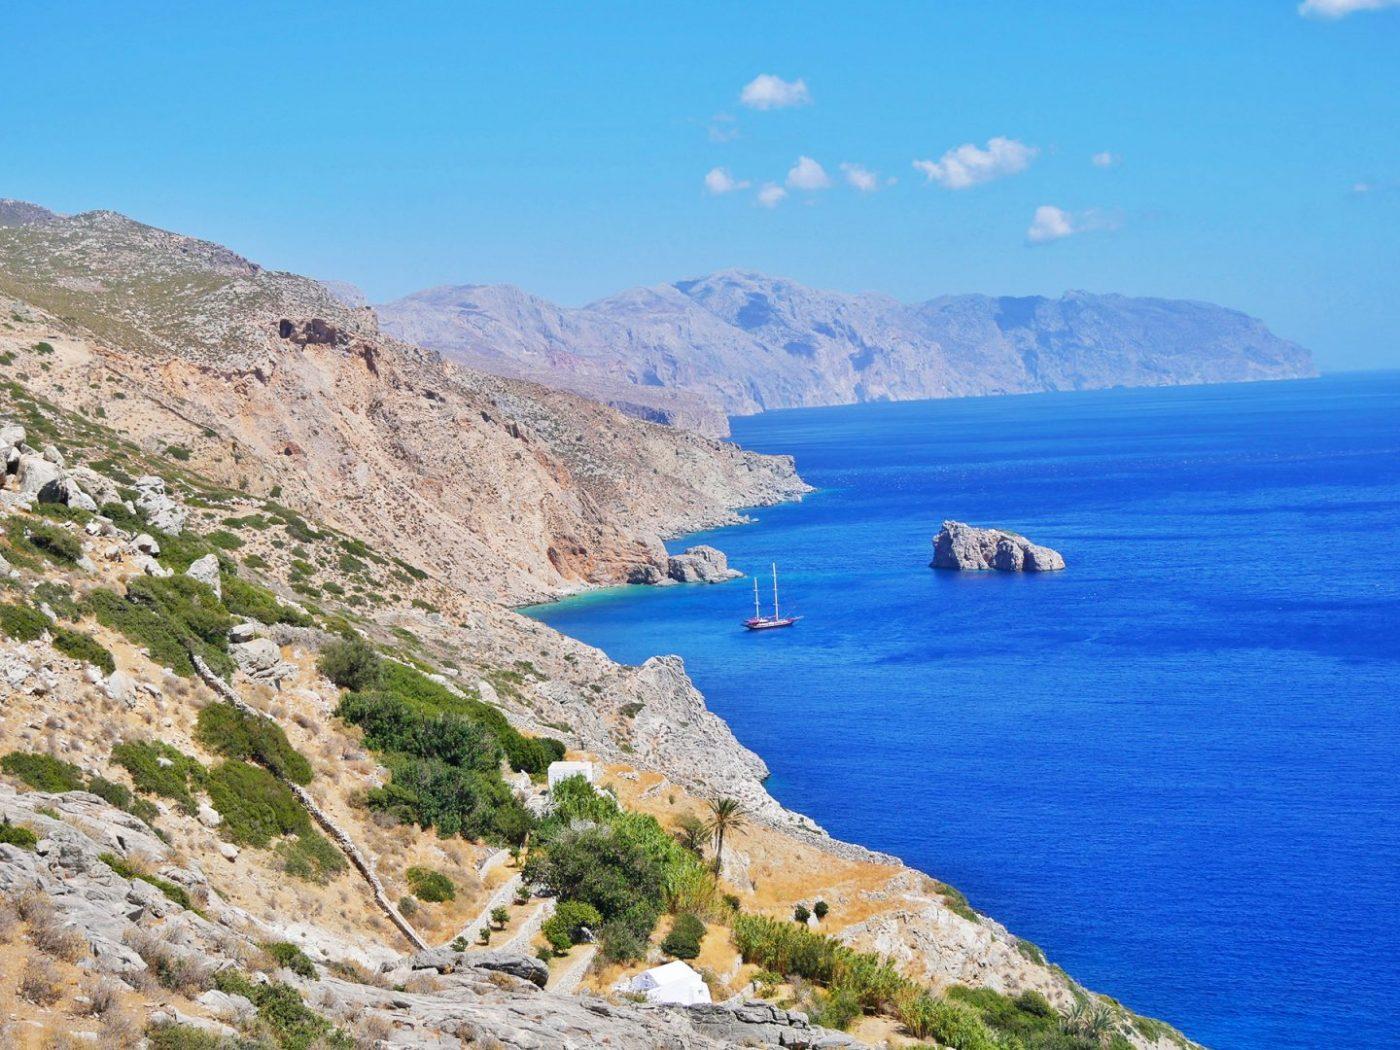 Greek Island Amorgos - where to travel in 2021